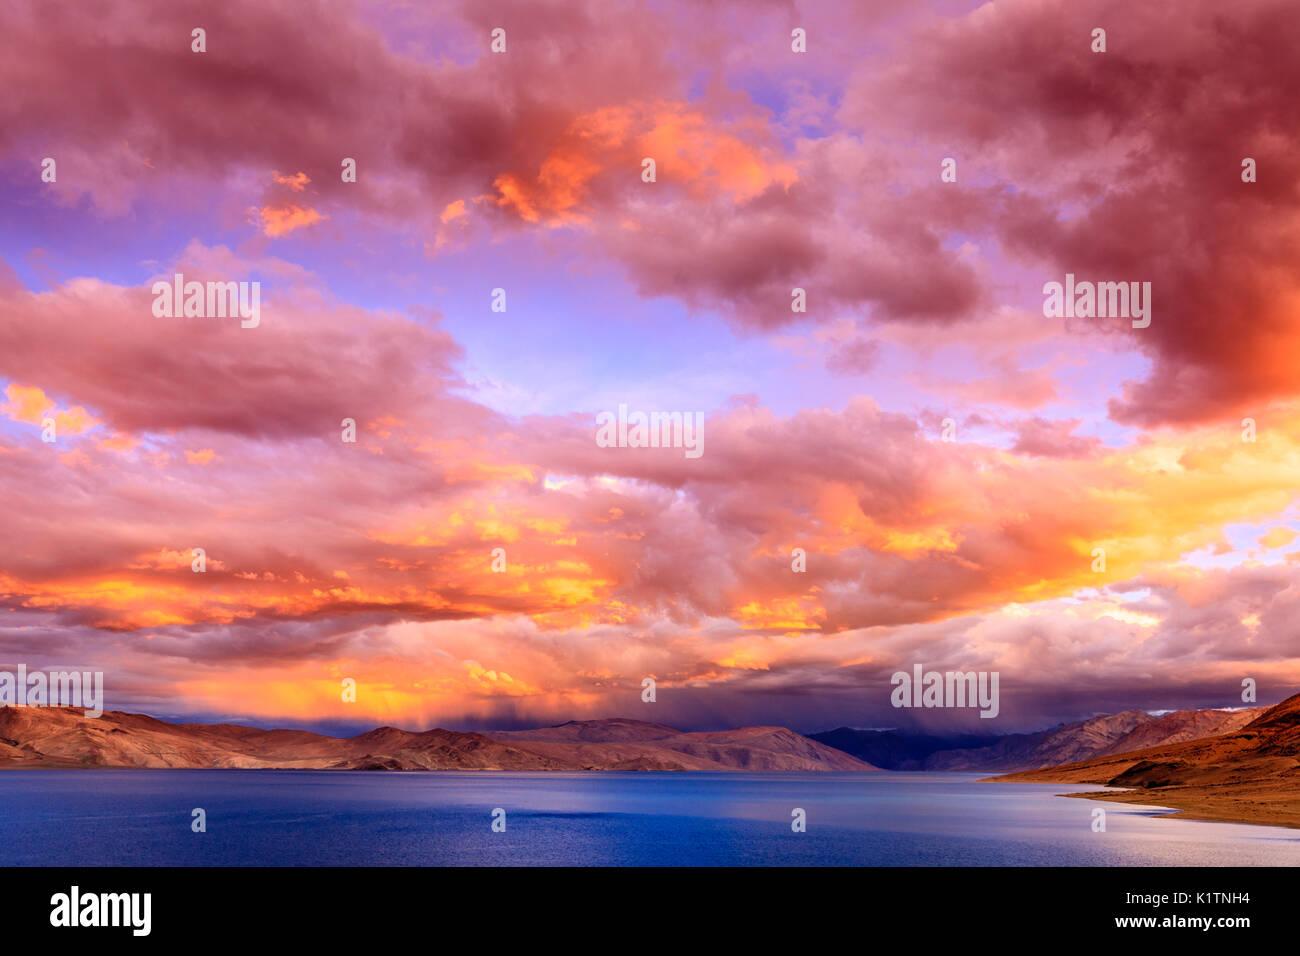 Sunset on lake Tso Moriri in the Himalayas, Kashmir, India - Stock Image